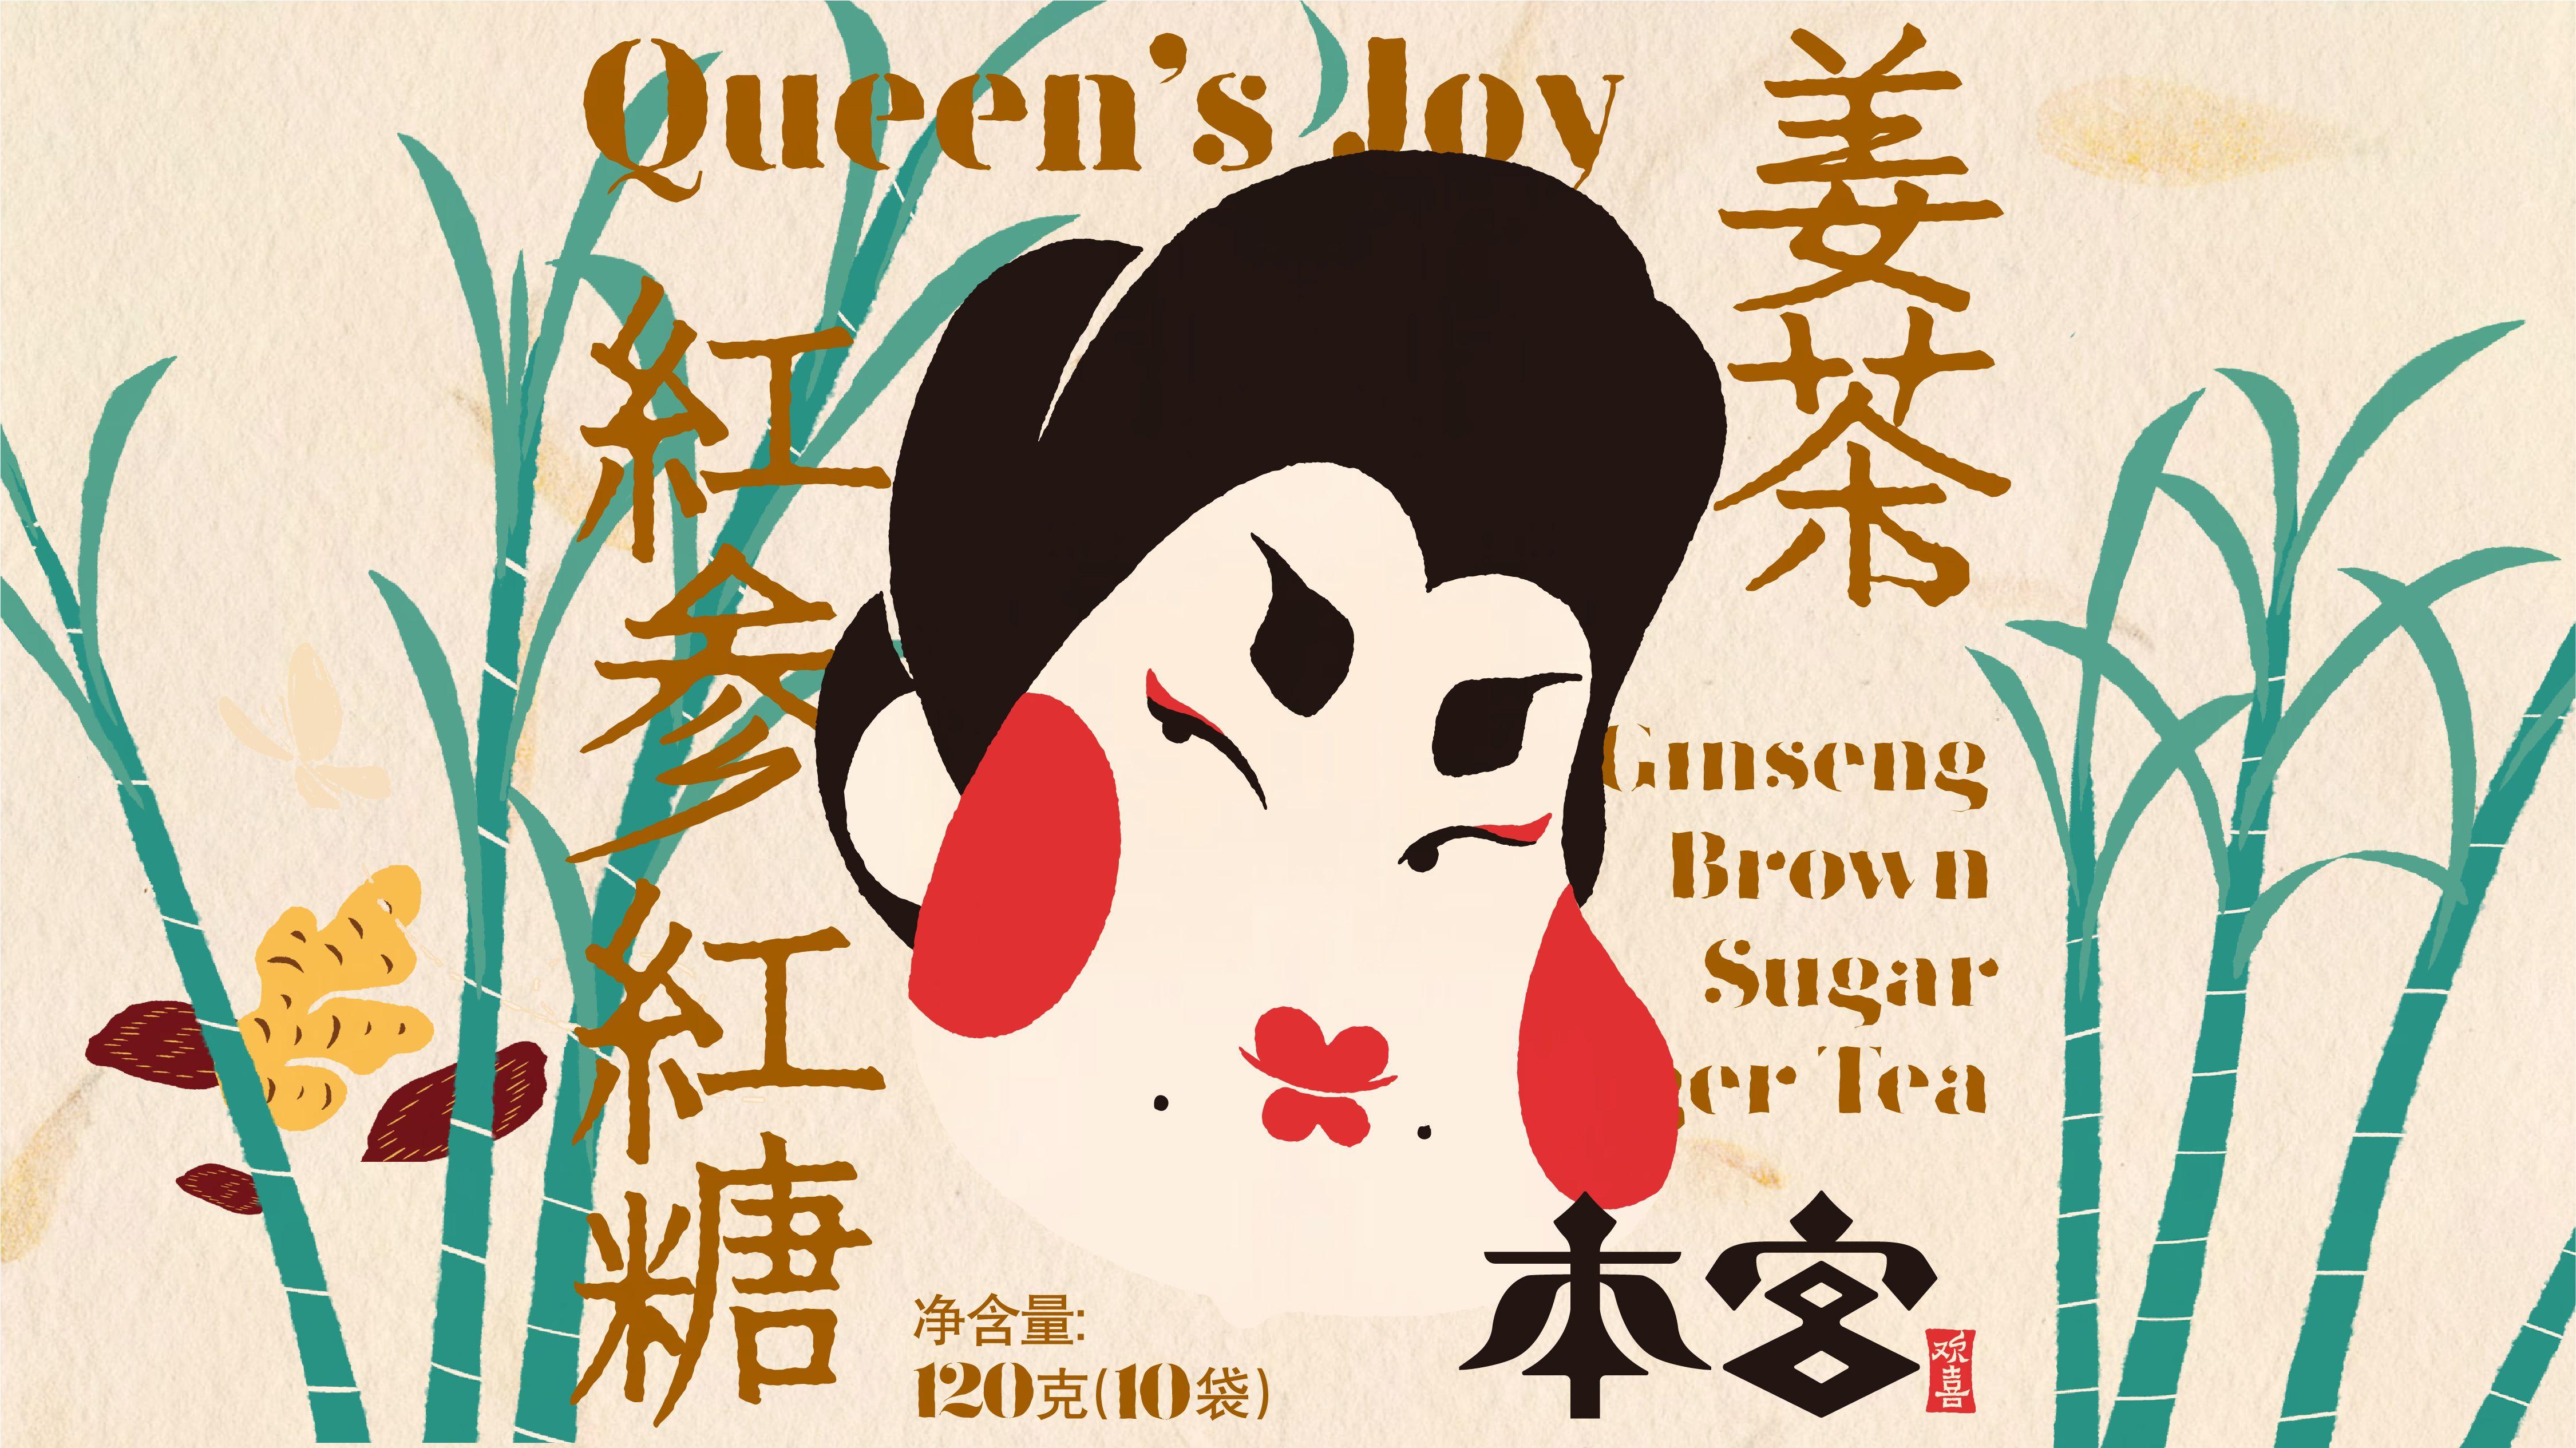 pin by pei on 如何用文化 ip 重塑东方滋补文化 poster design asian design poster ads